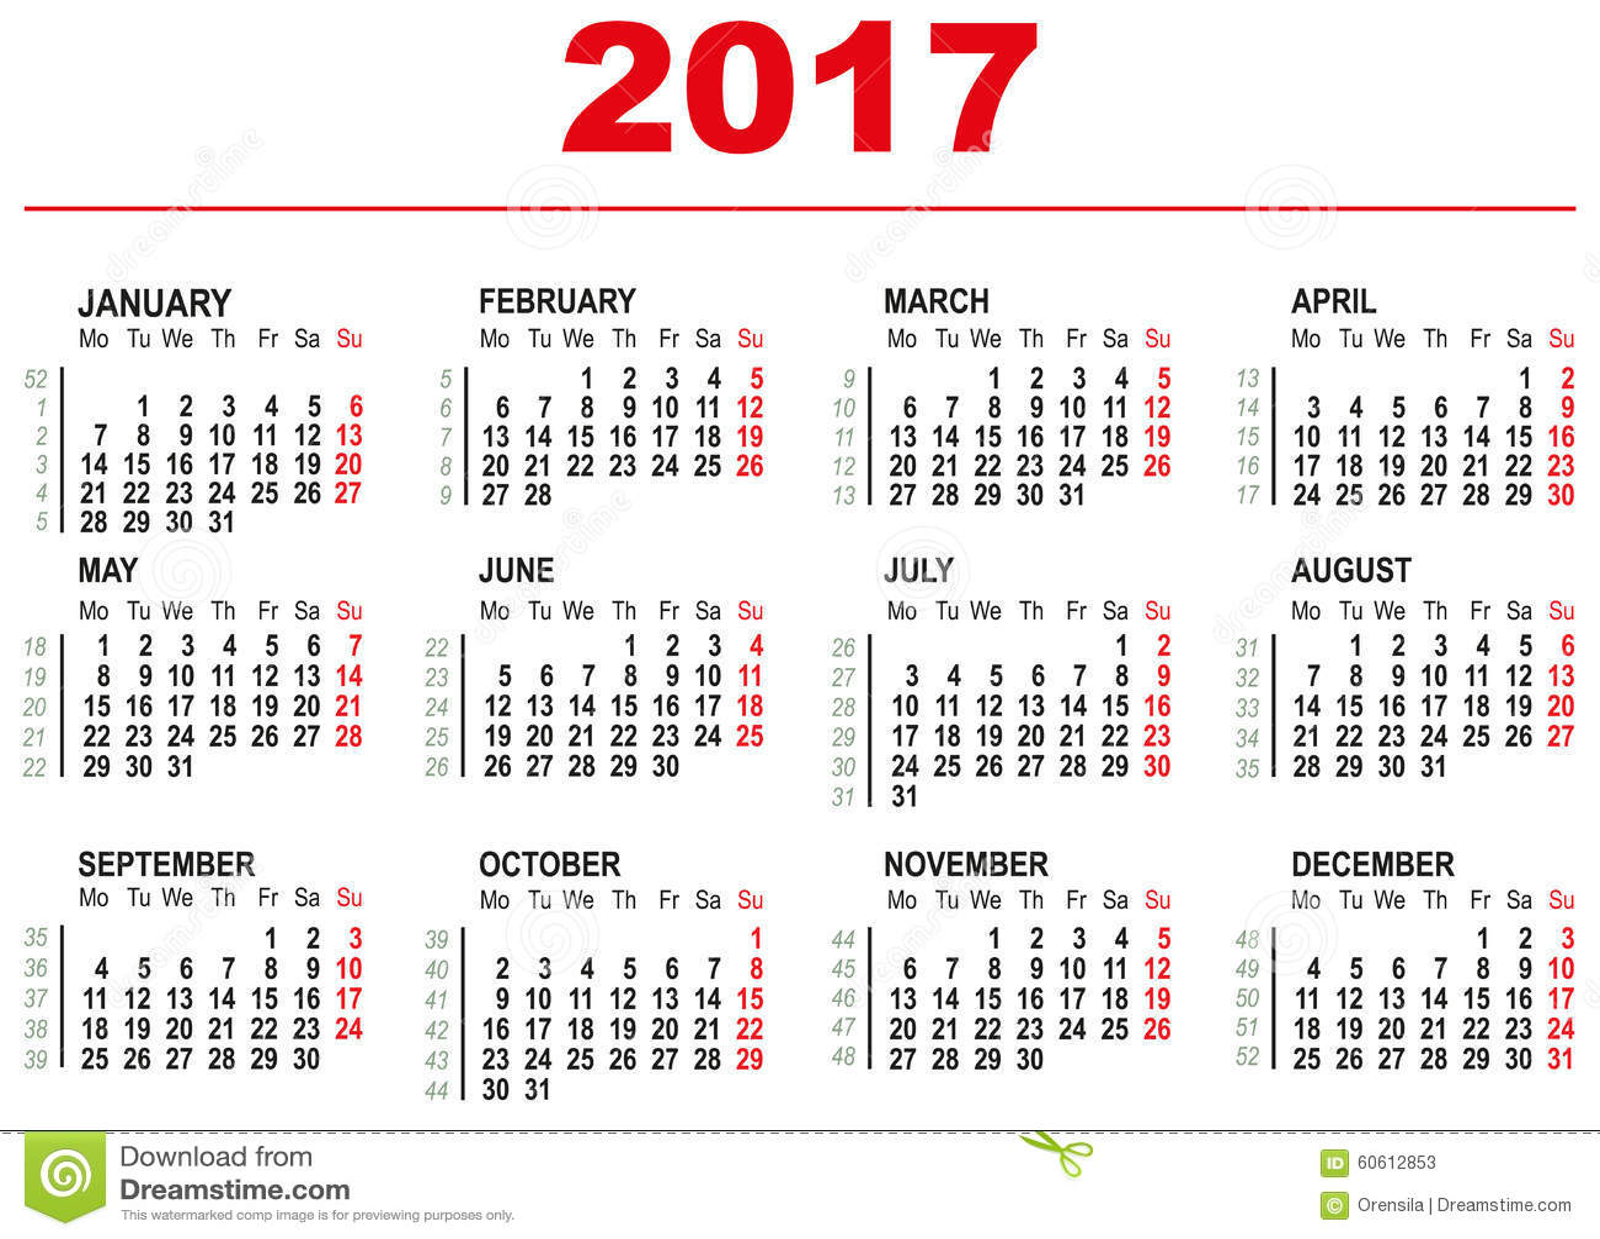 6 week calendar template